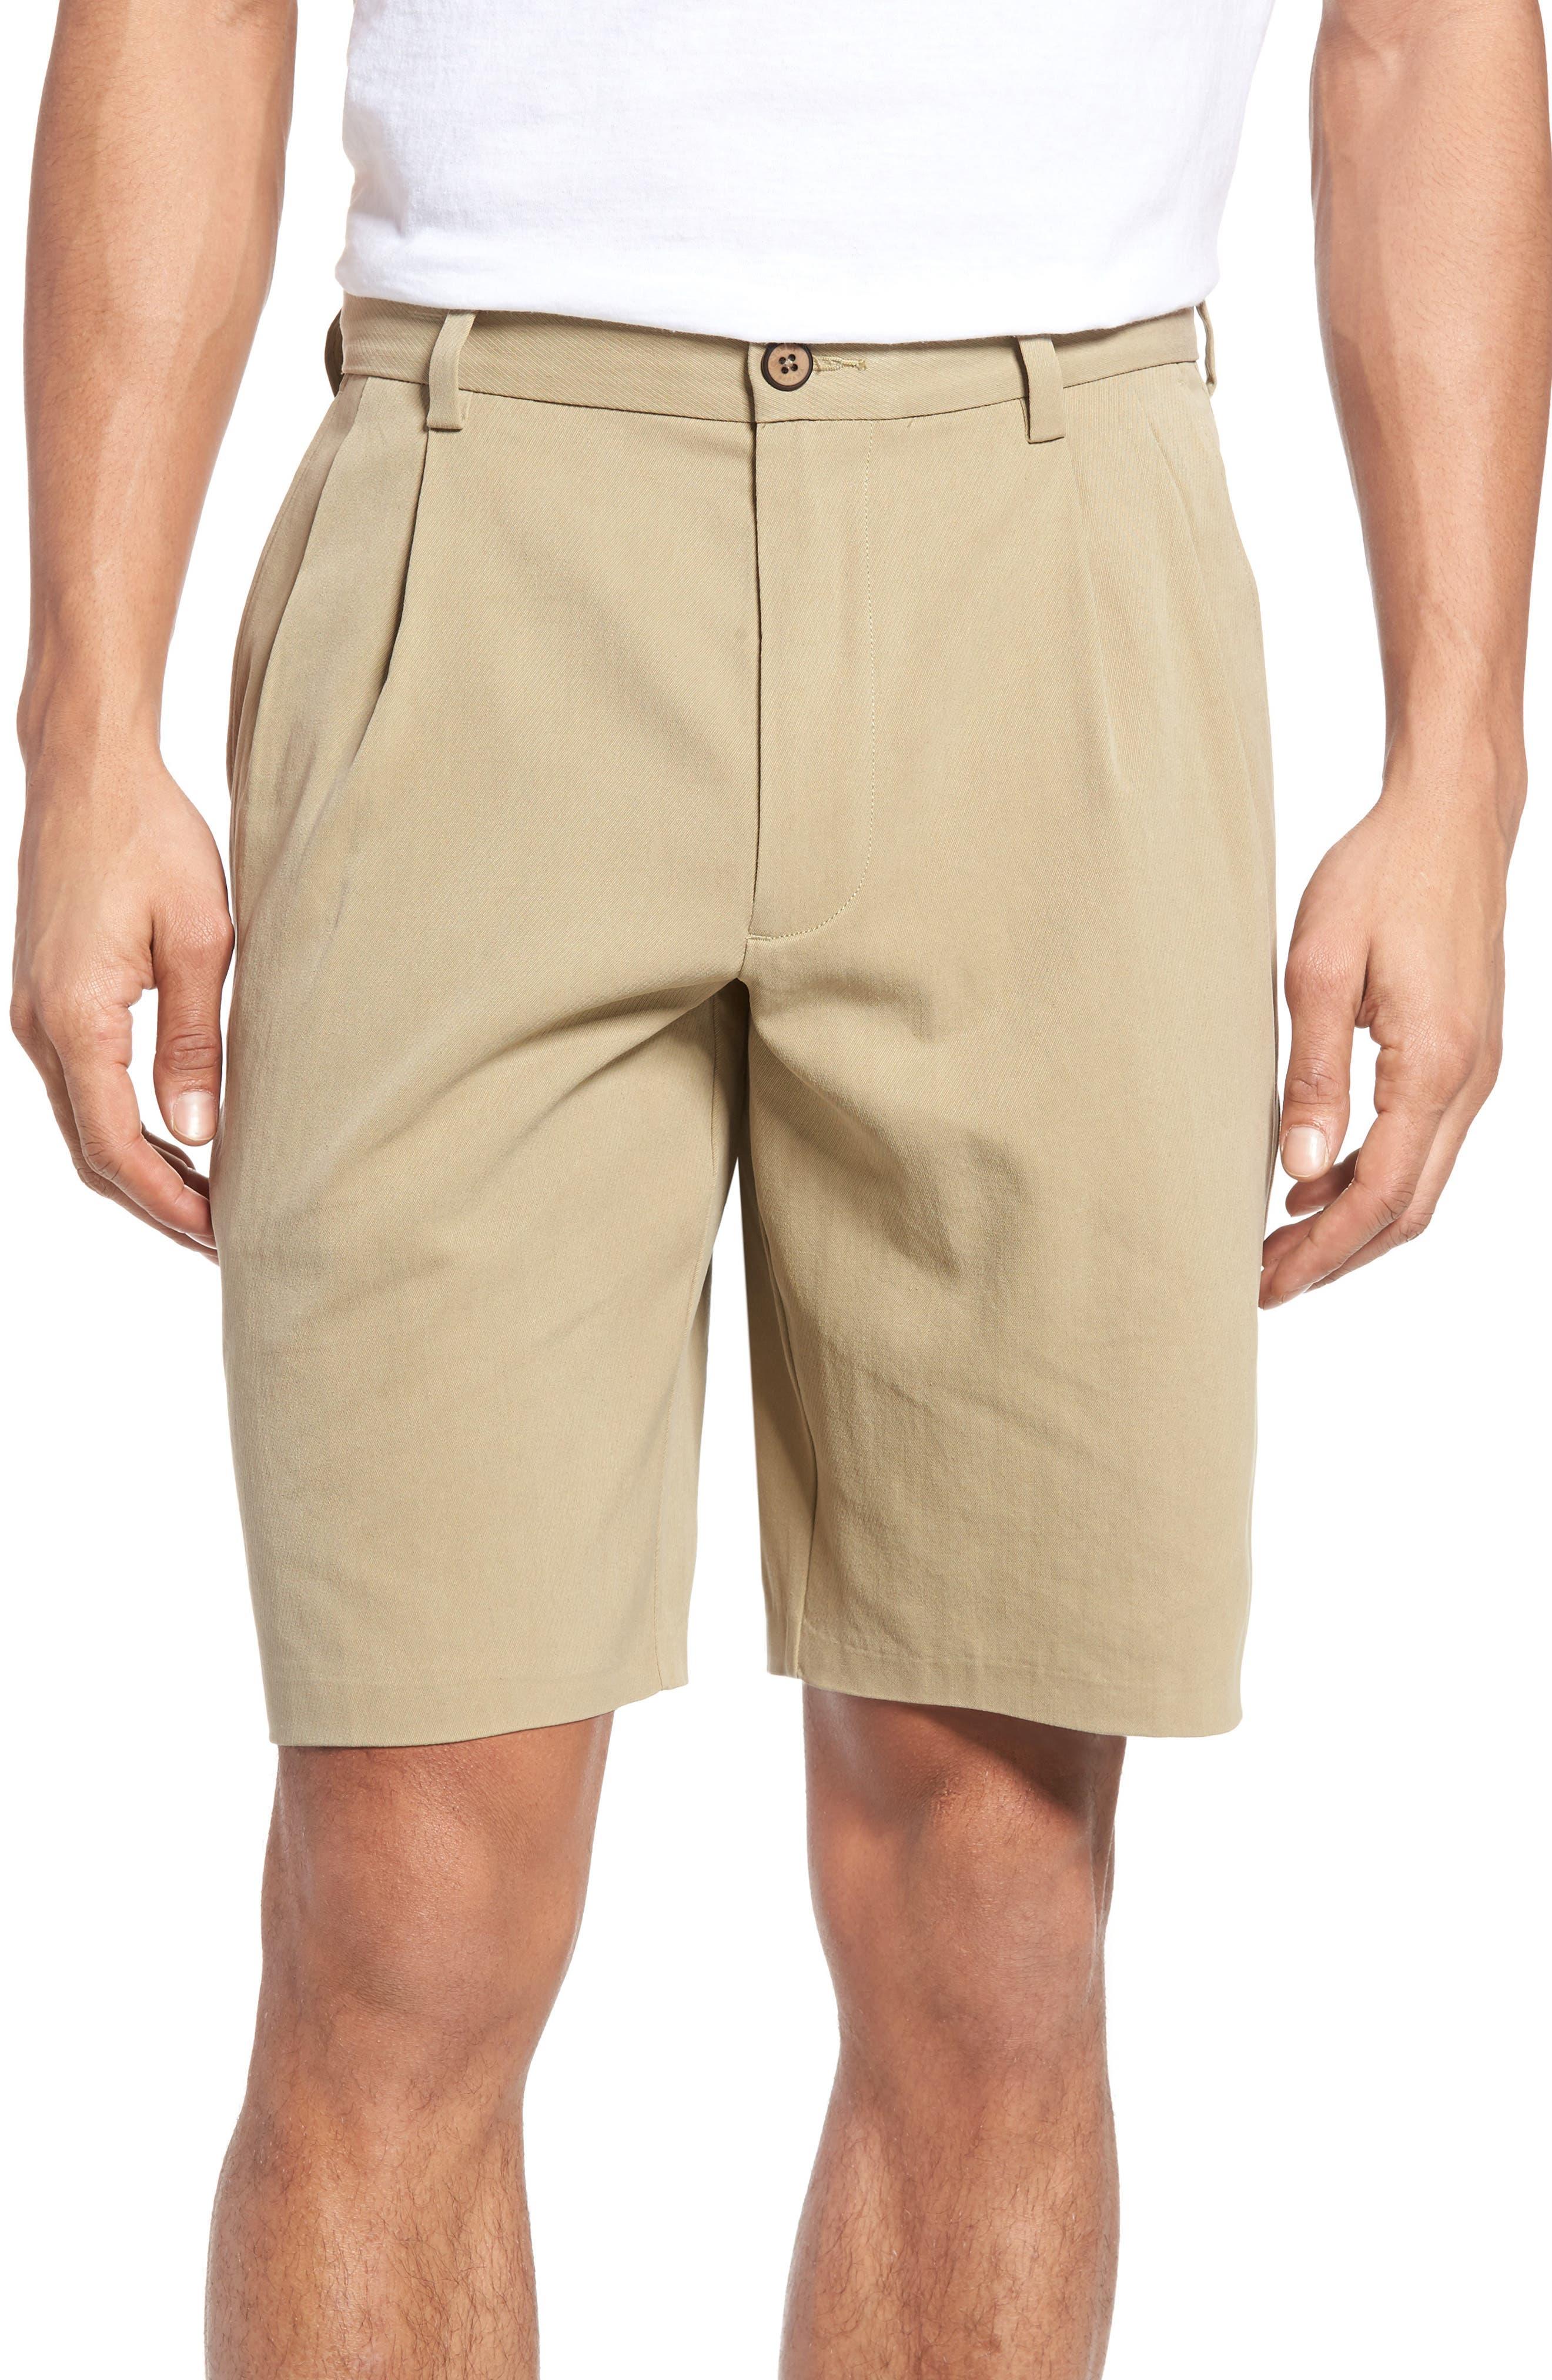 St. Thomas Pleated Shorts,                             Main thumbnail 1, color,                             Sisal